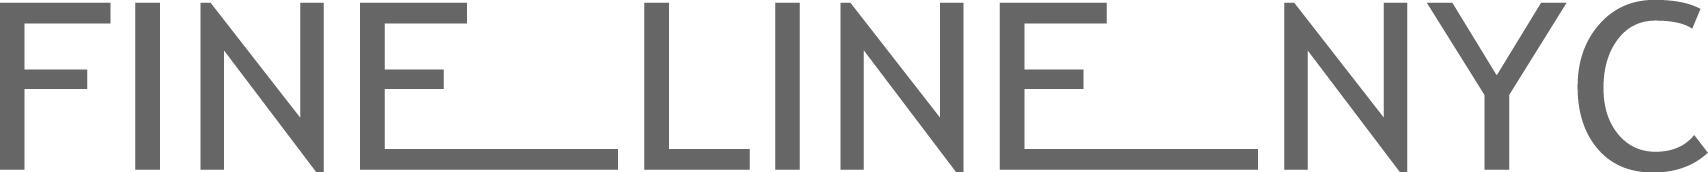 FINELINENYC_footer